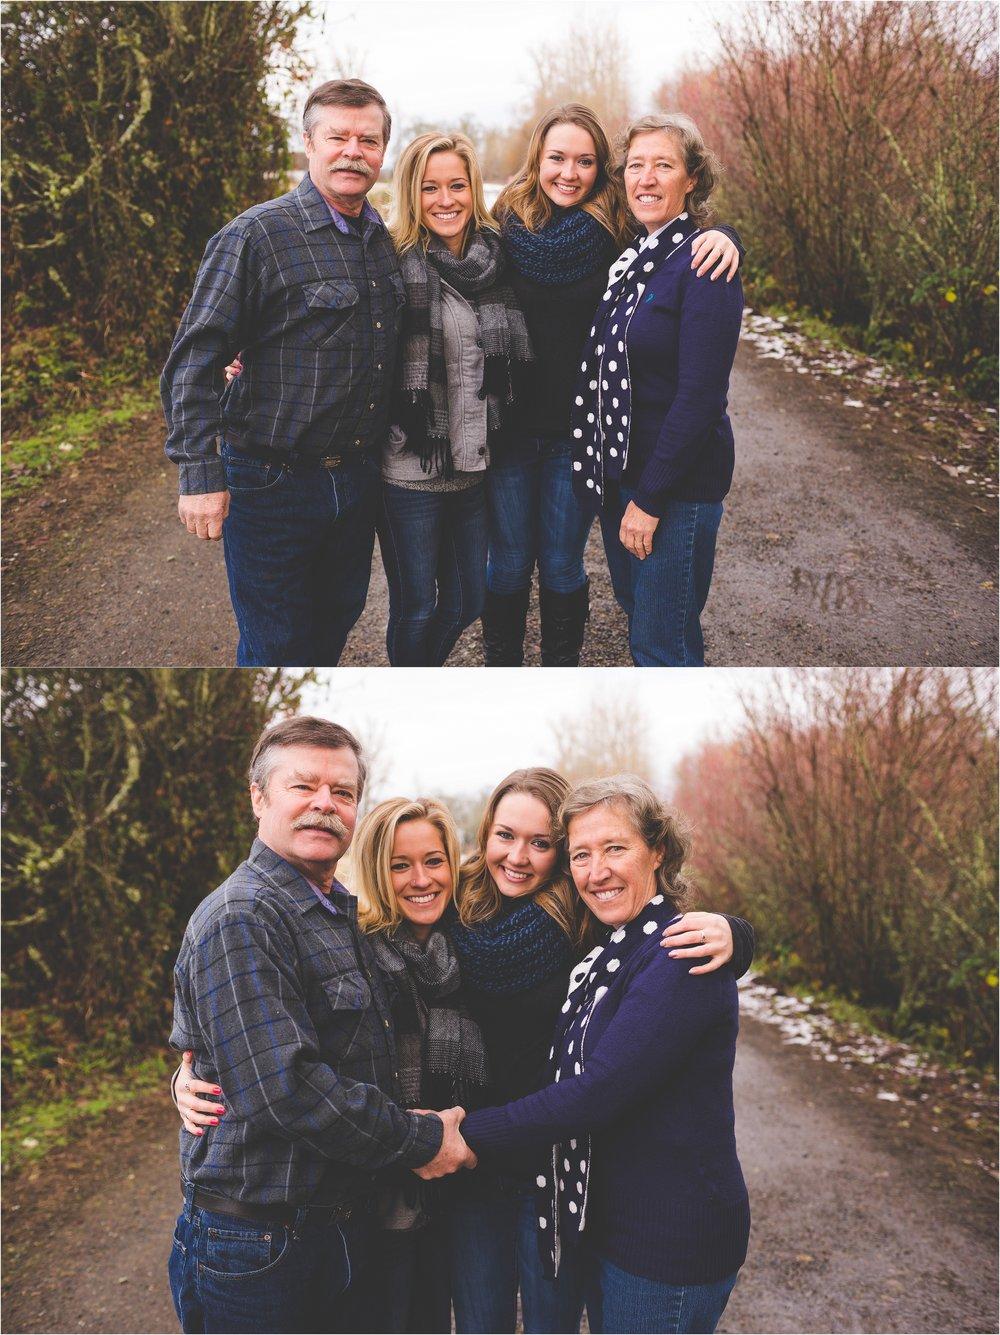 family-session-at-nisqually-national-wildlife-refuge-jannicka-mayte-olympia-wa-family-photographer_0011.jpg